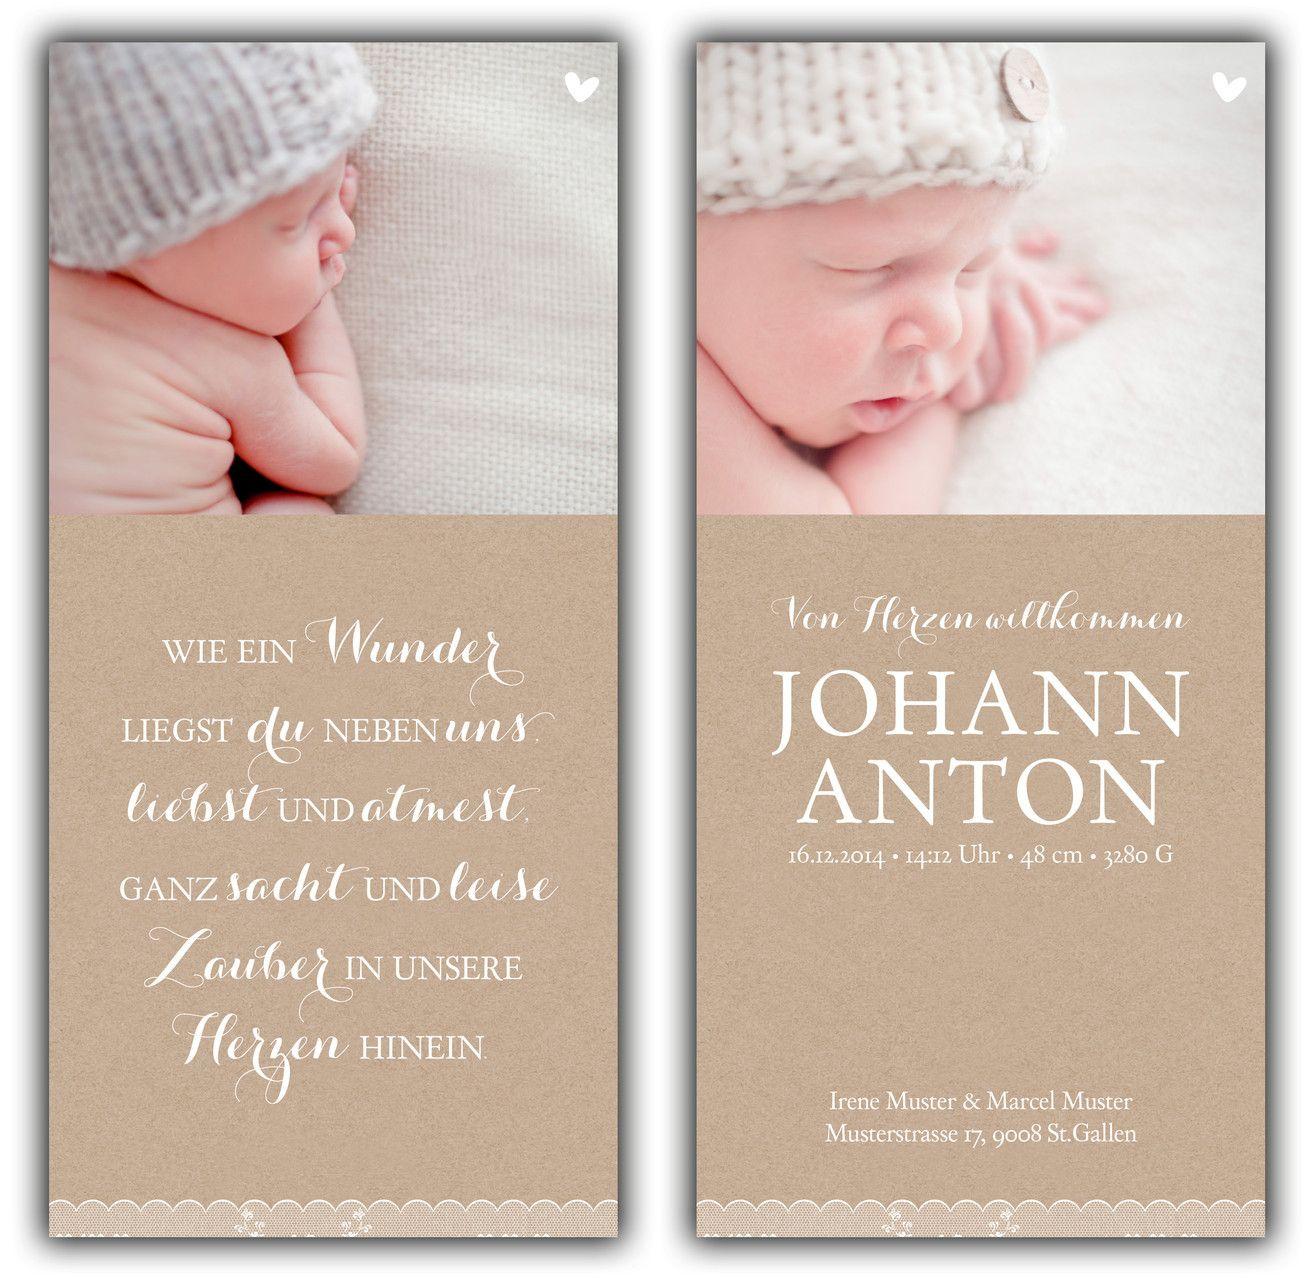 geburtskarte baby geburt dankeskarte geburt und danksagung geburt. Black Bedroom Furniture Sets. Home Design Ideas